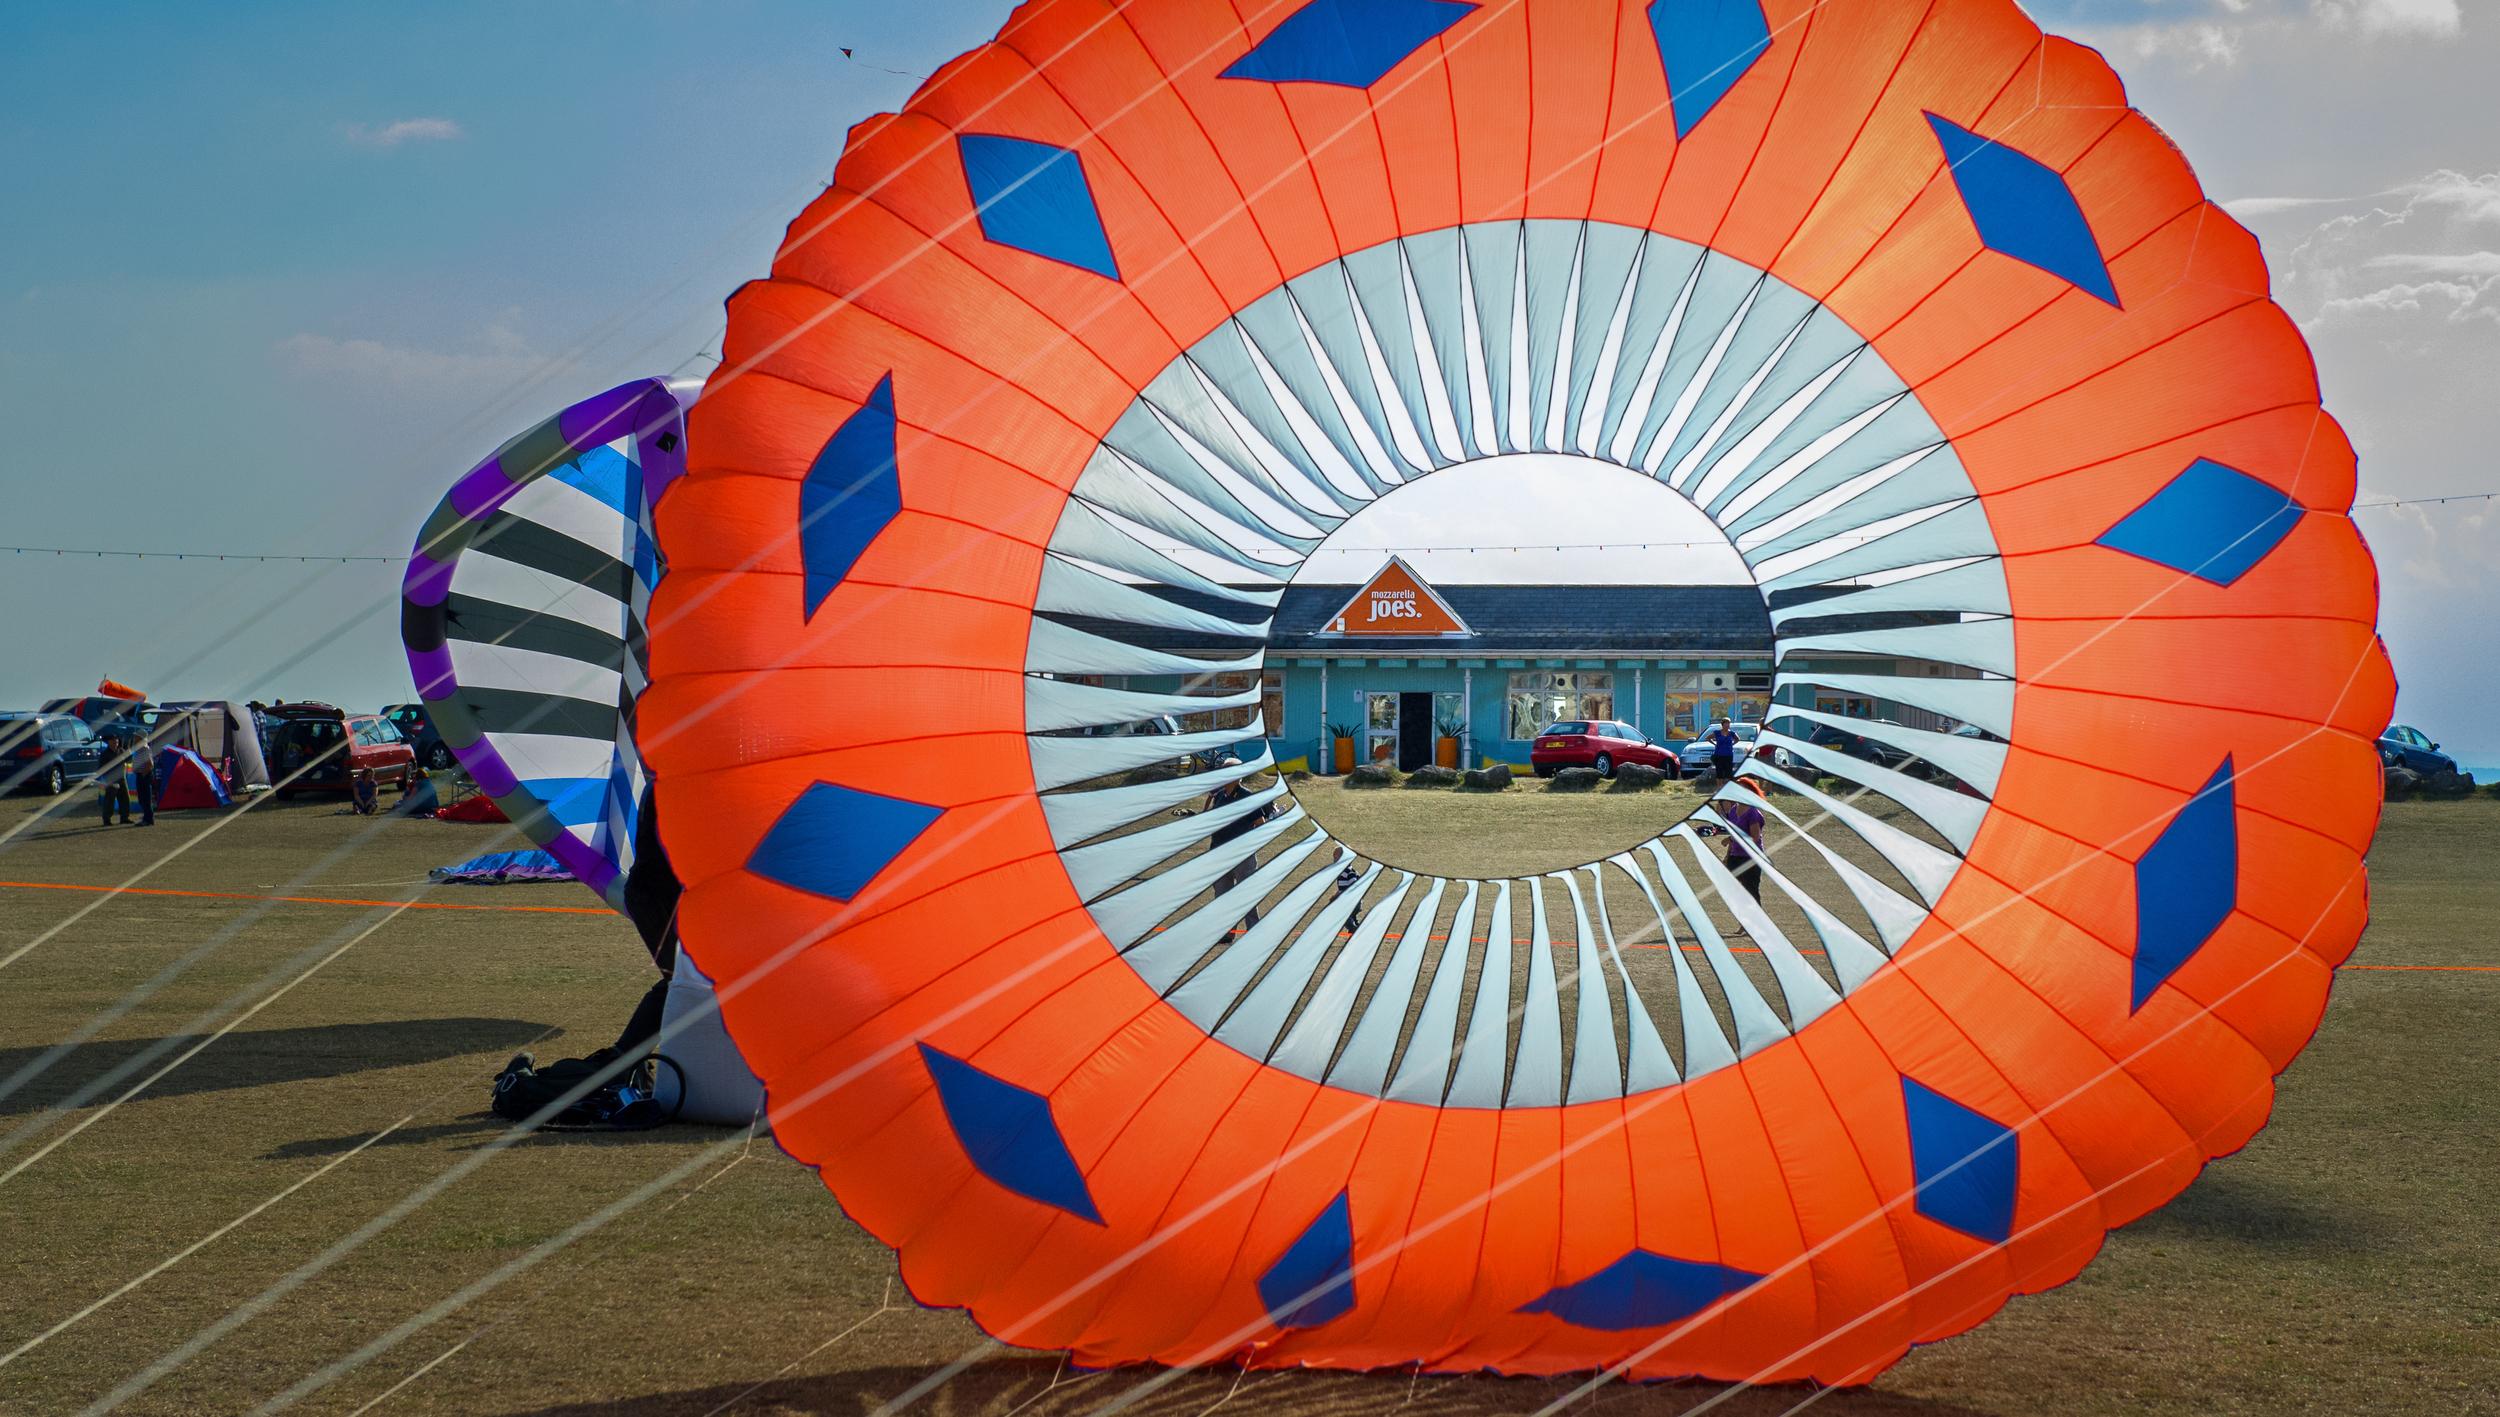 Kite Festival in front of Mozzarella Joes